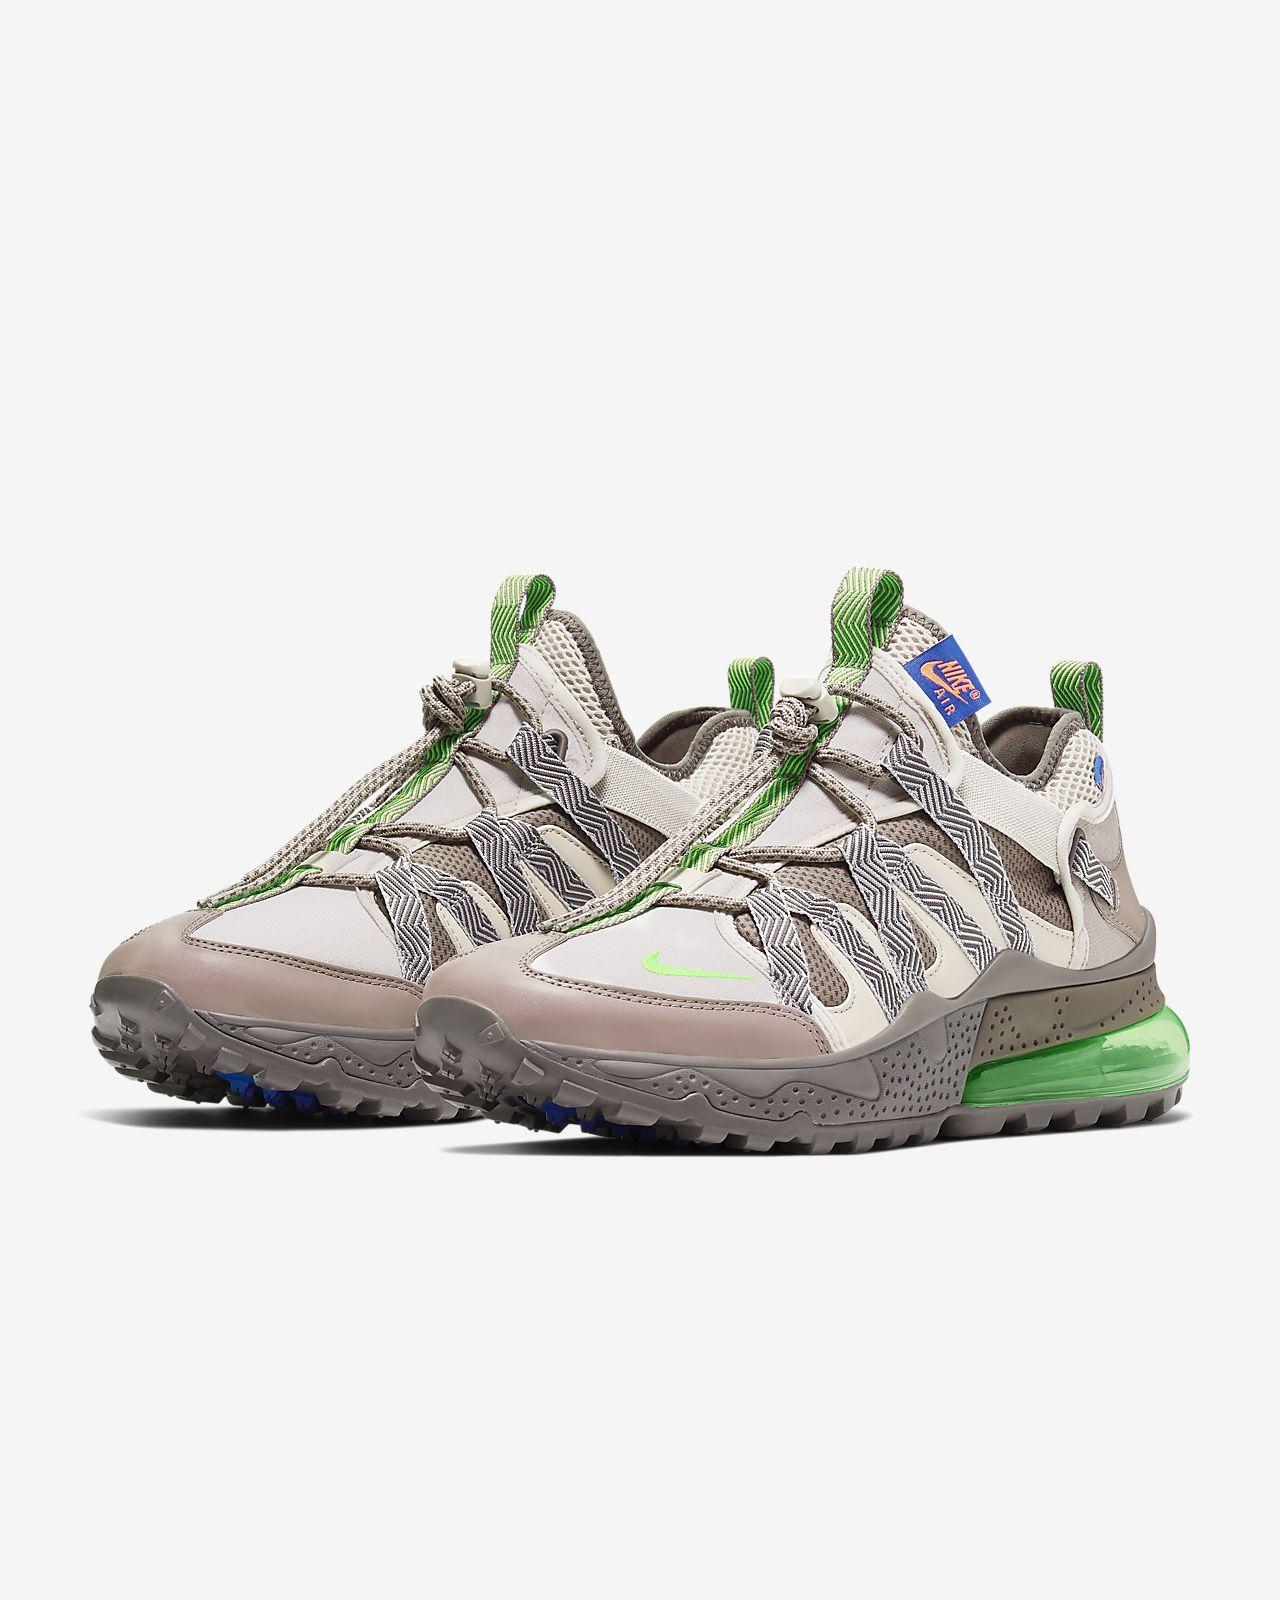 Nike Air Max 270 Bowfin Men's Shoe